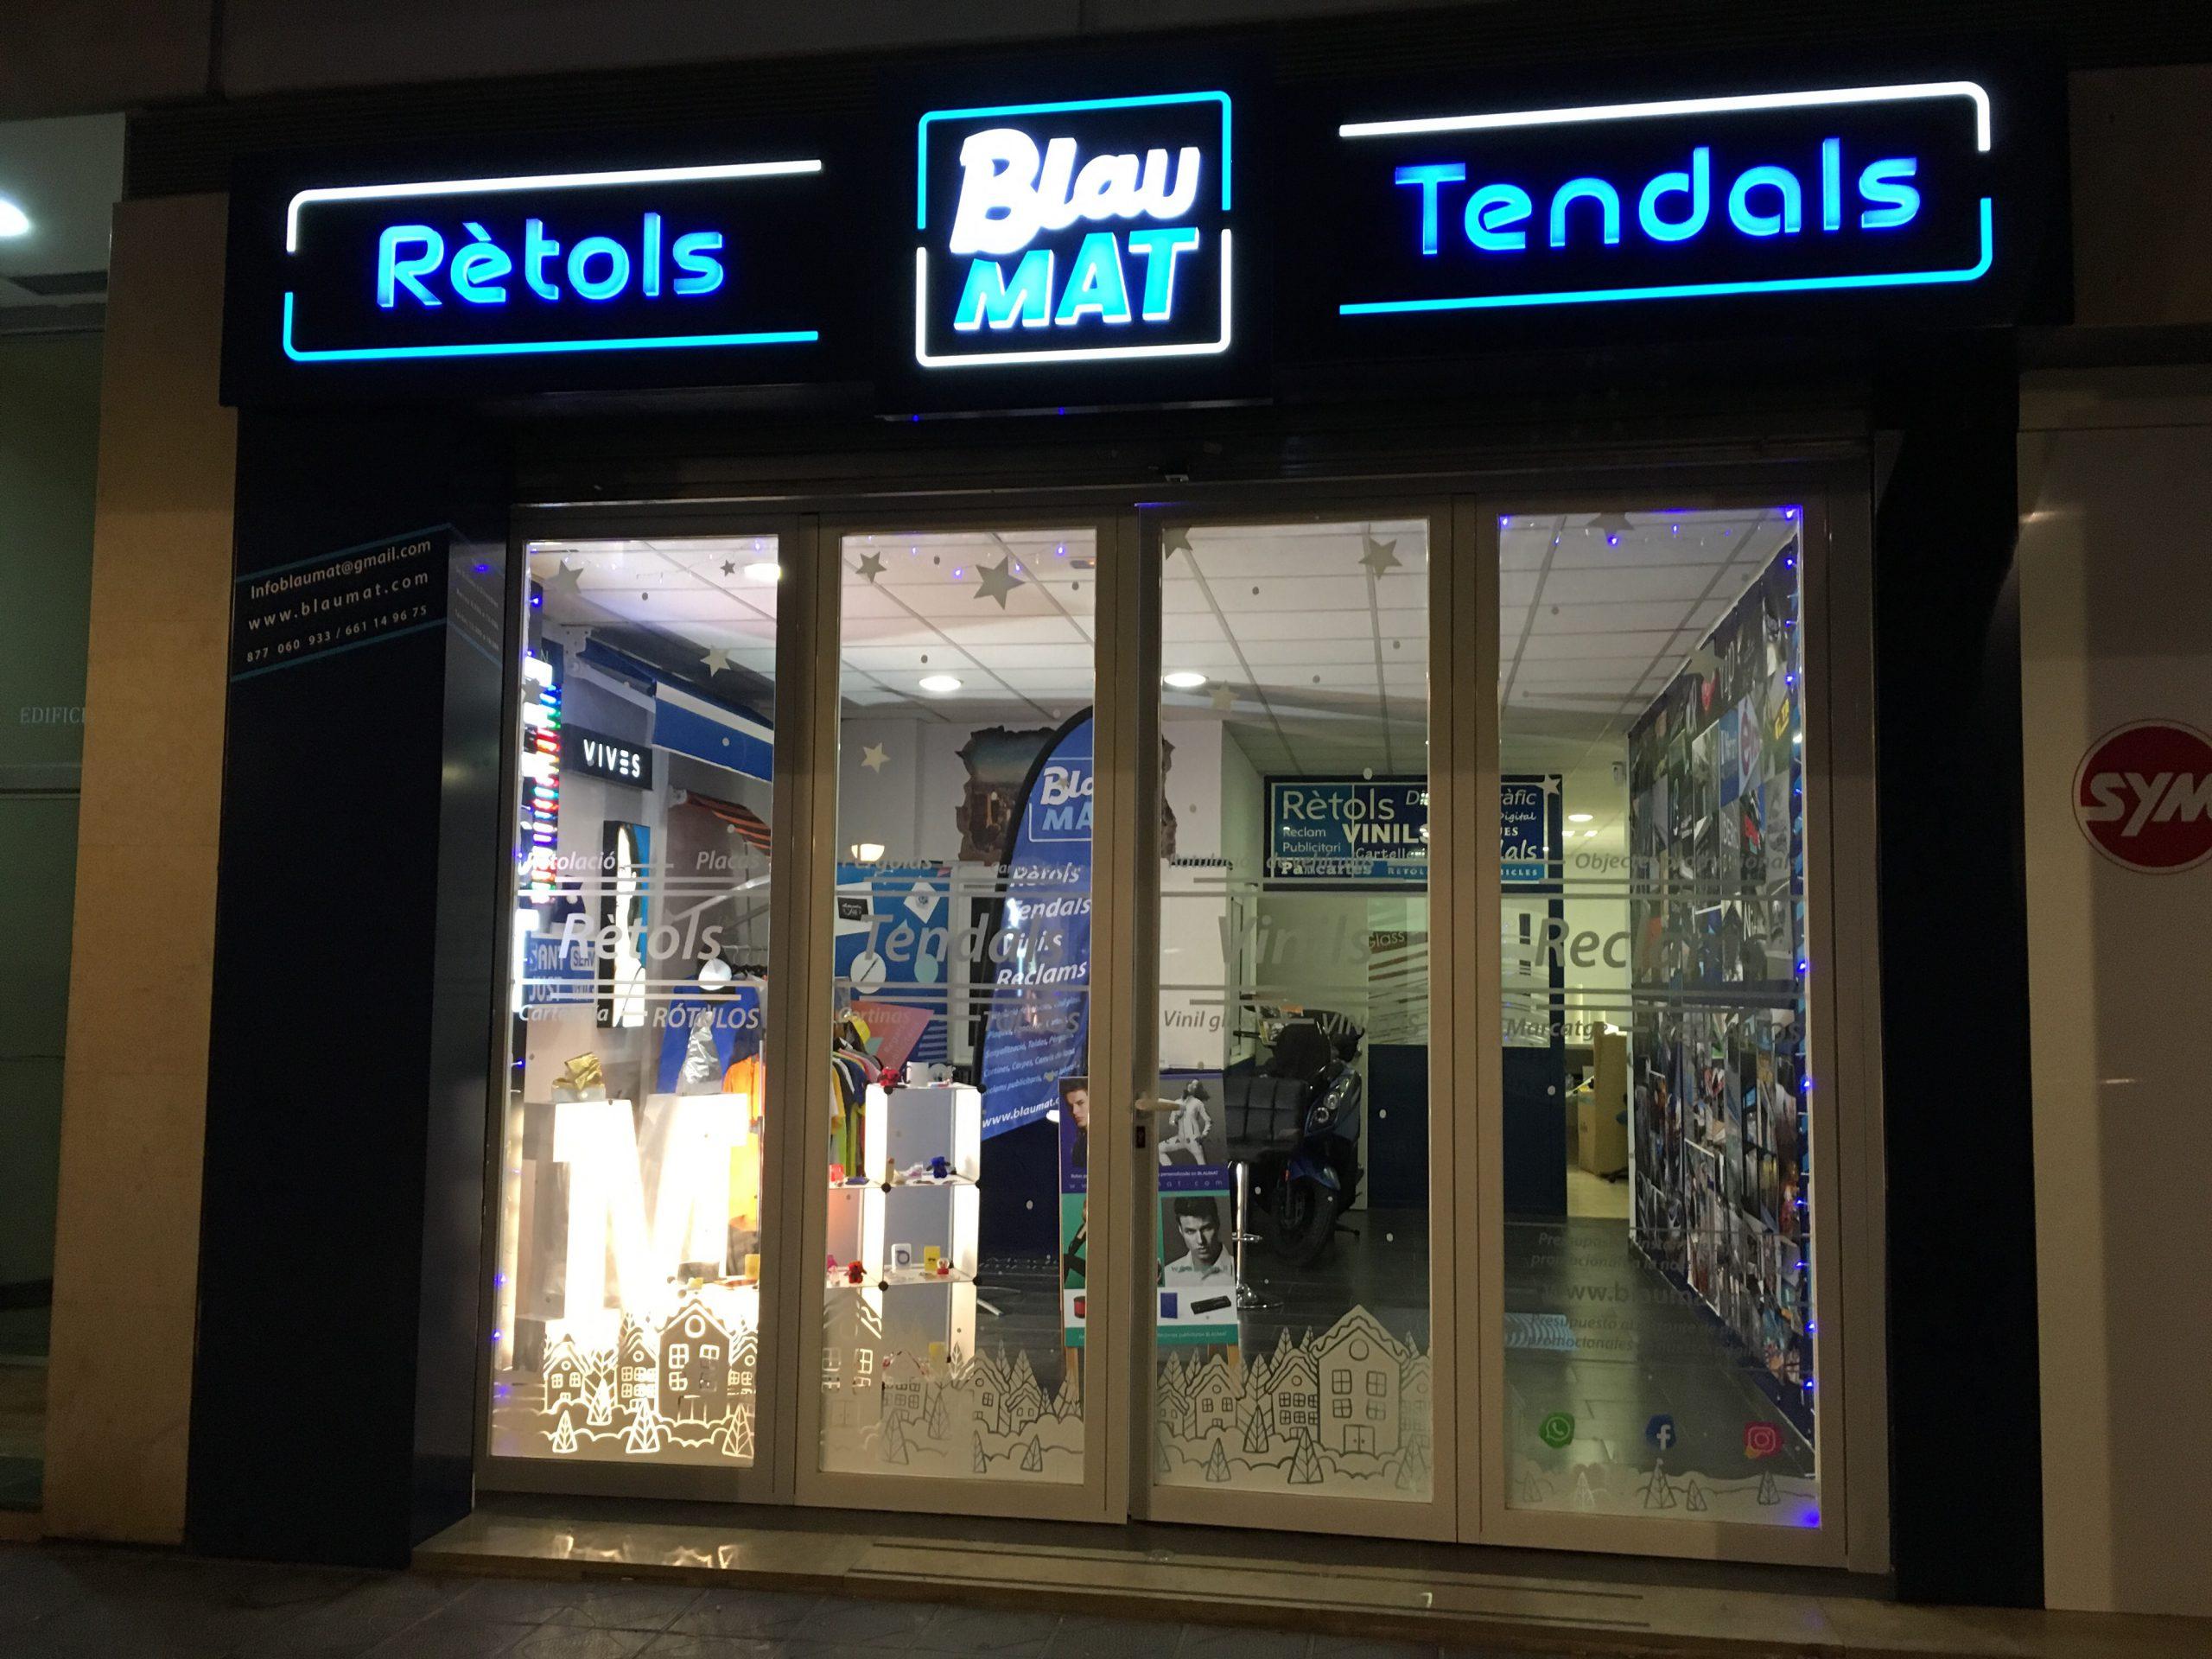 tienda de rótulos Blaumat TARRAGONA